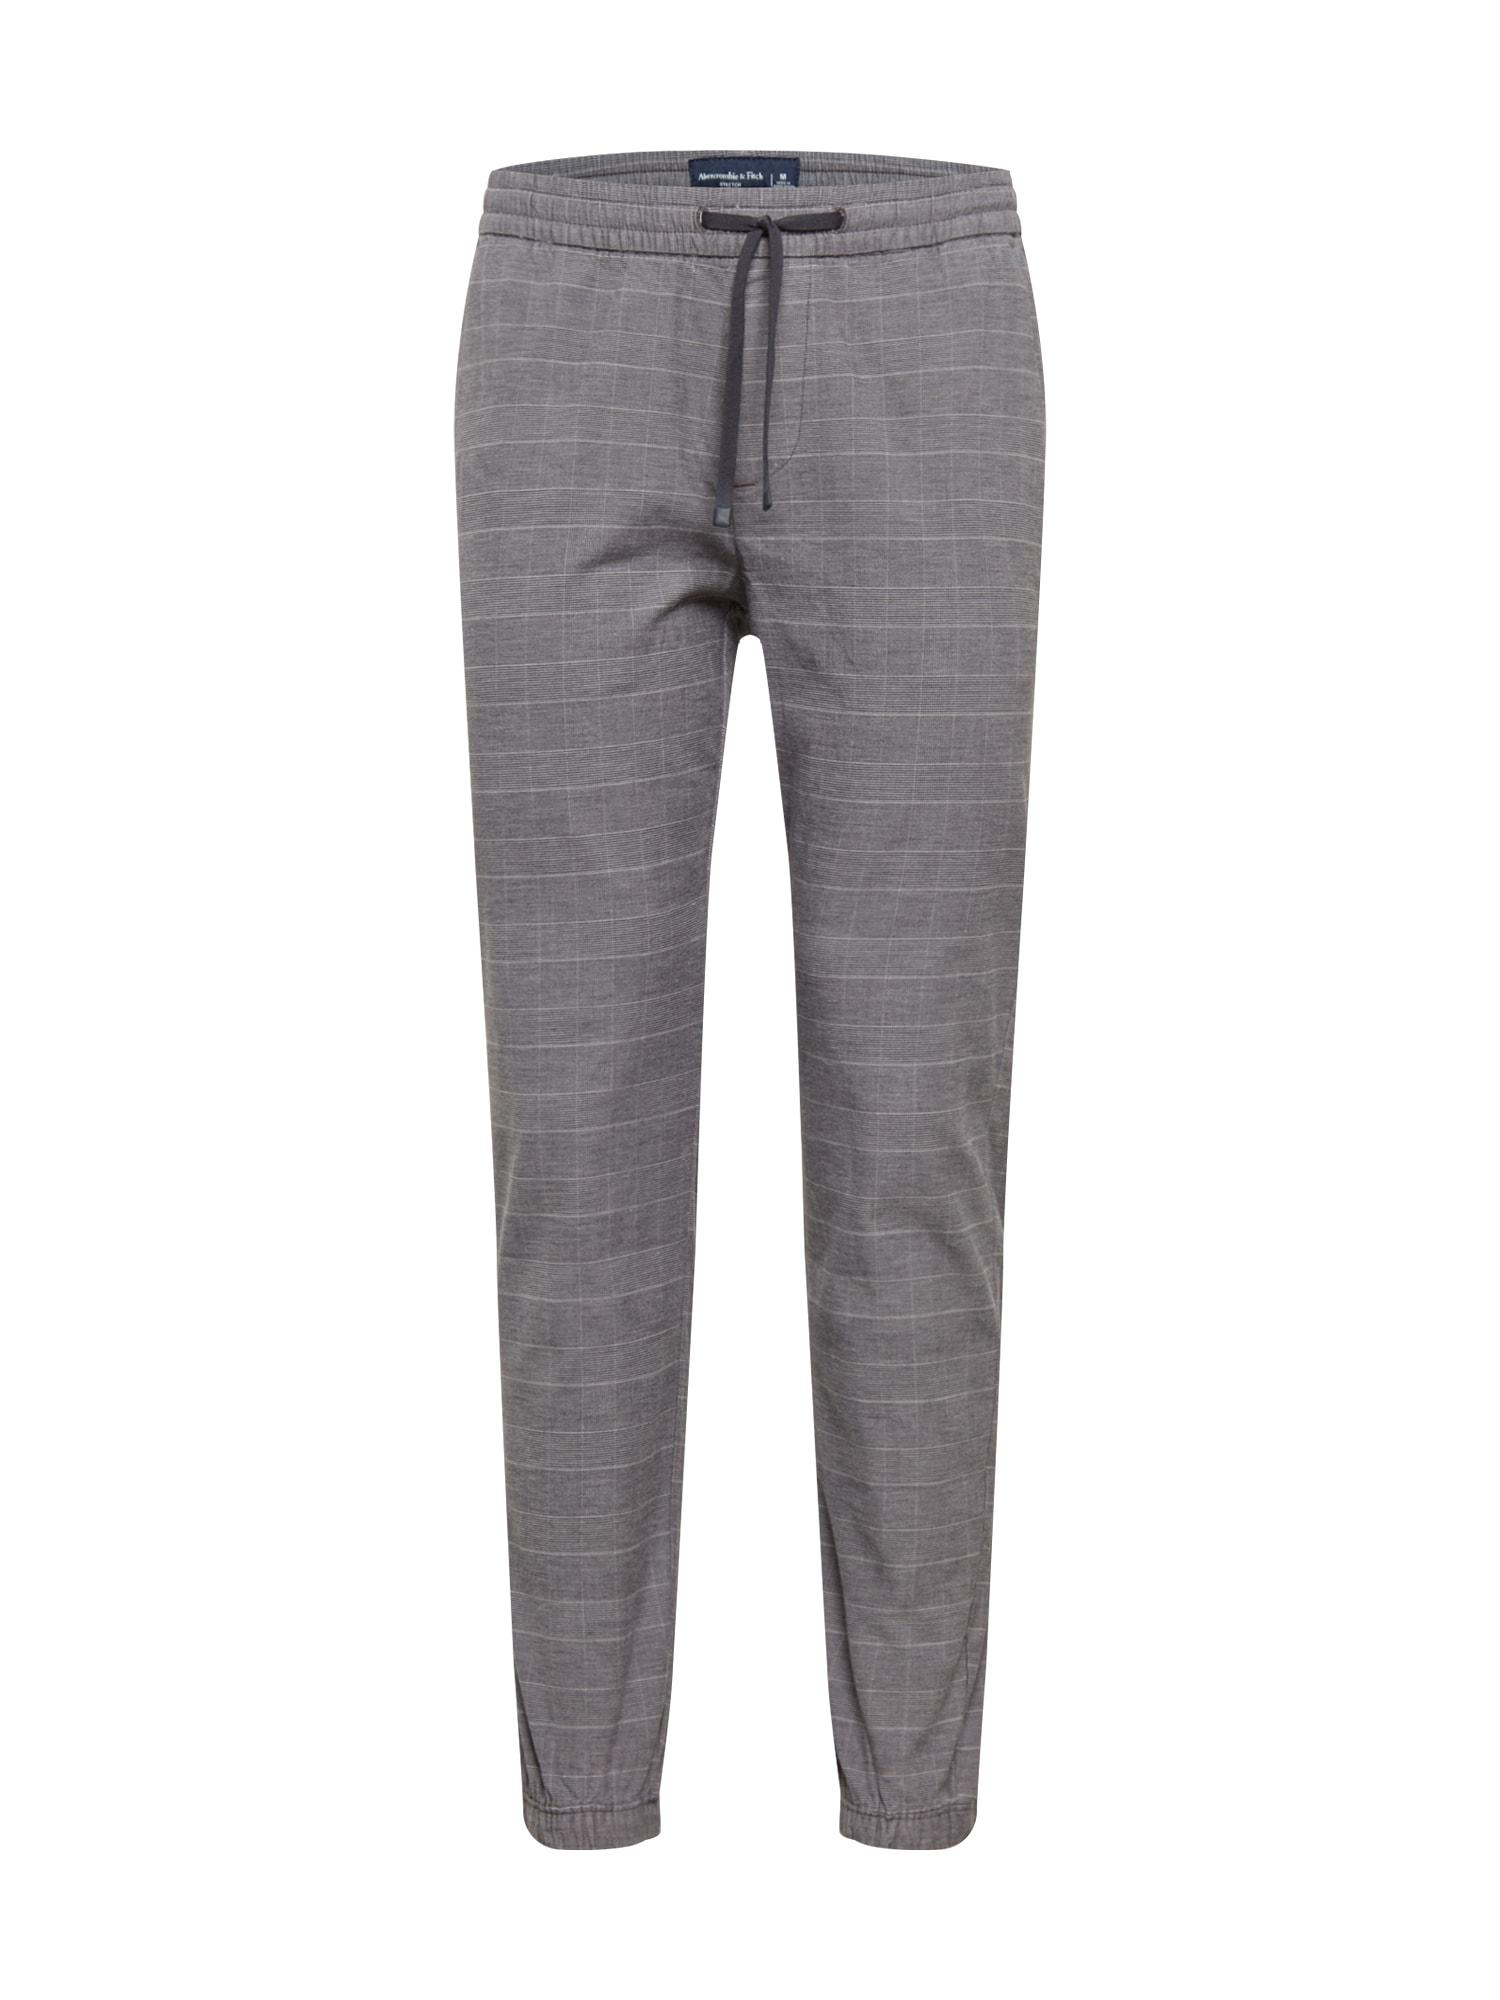 Abercrombie & Fitch Kelnės pilka / balta